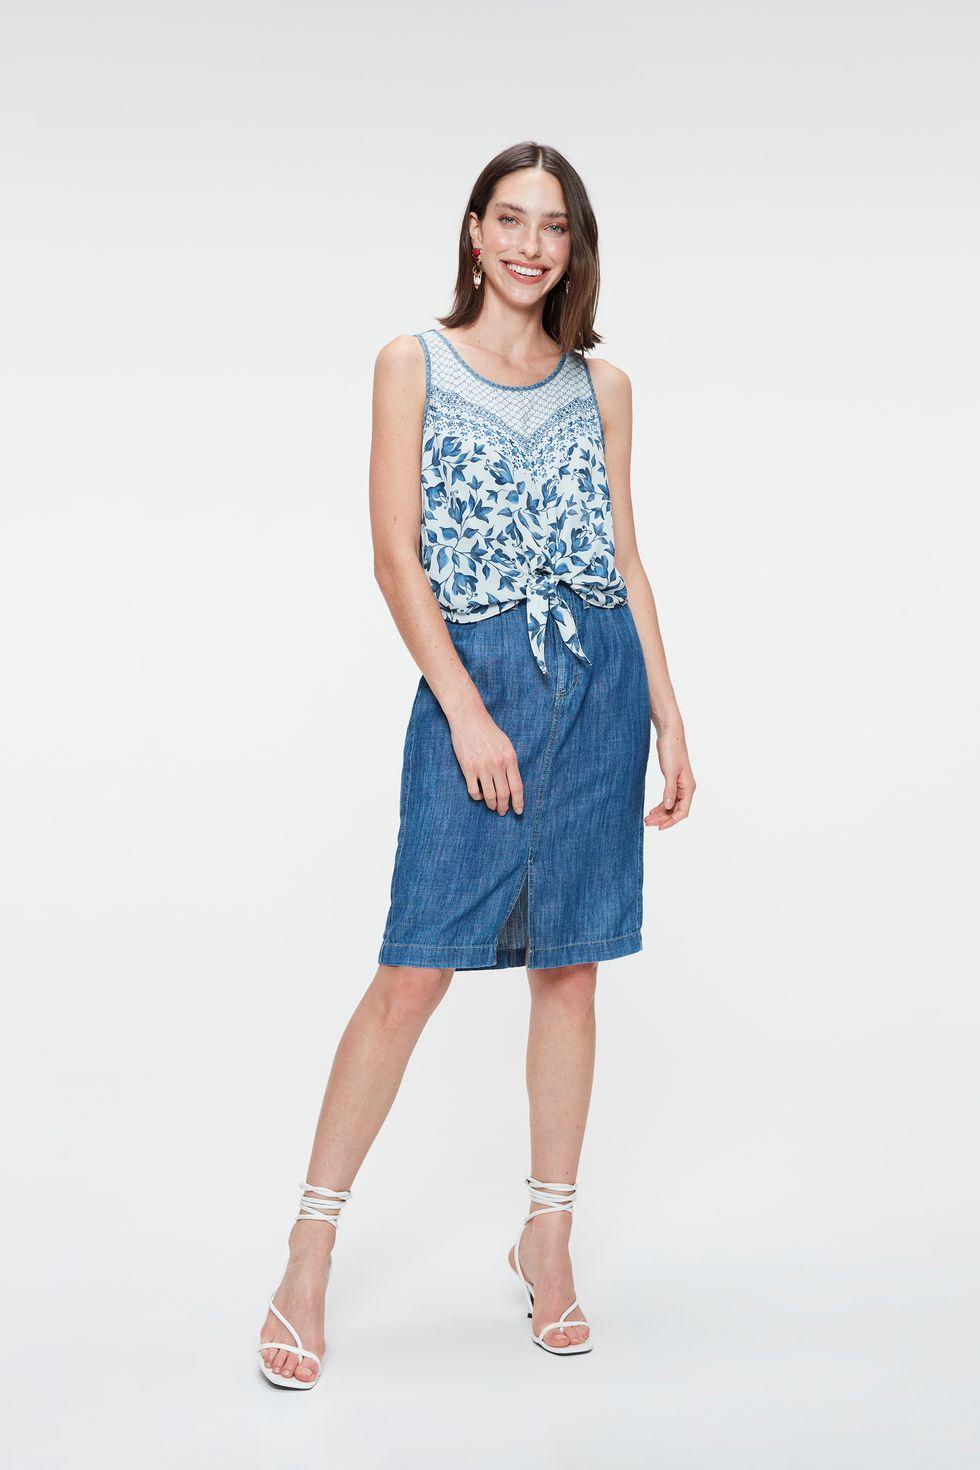 Blusa-sem-Mangas-Jeans-Estampa-Floral-Detalhe-1--